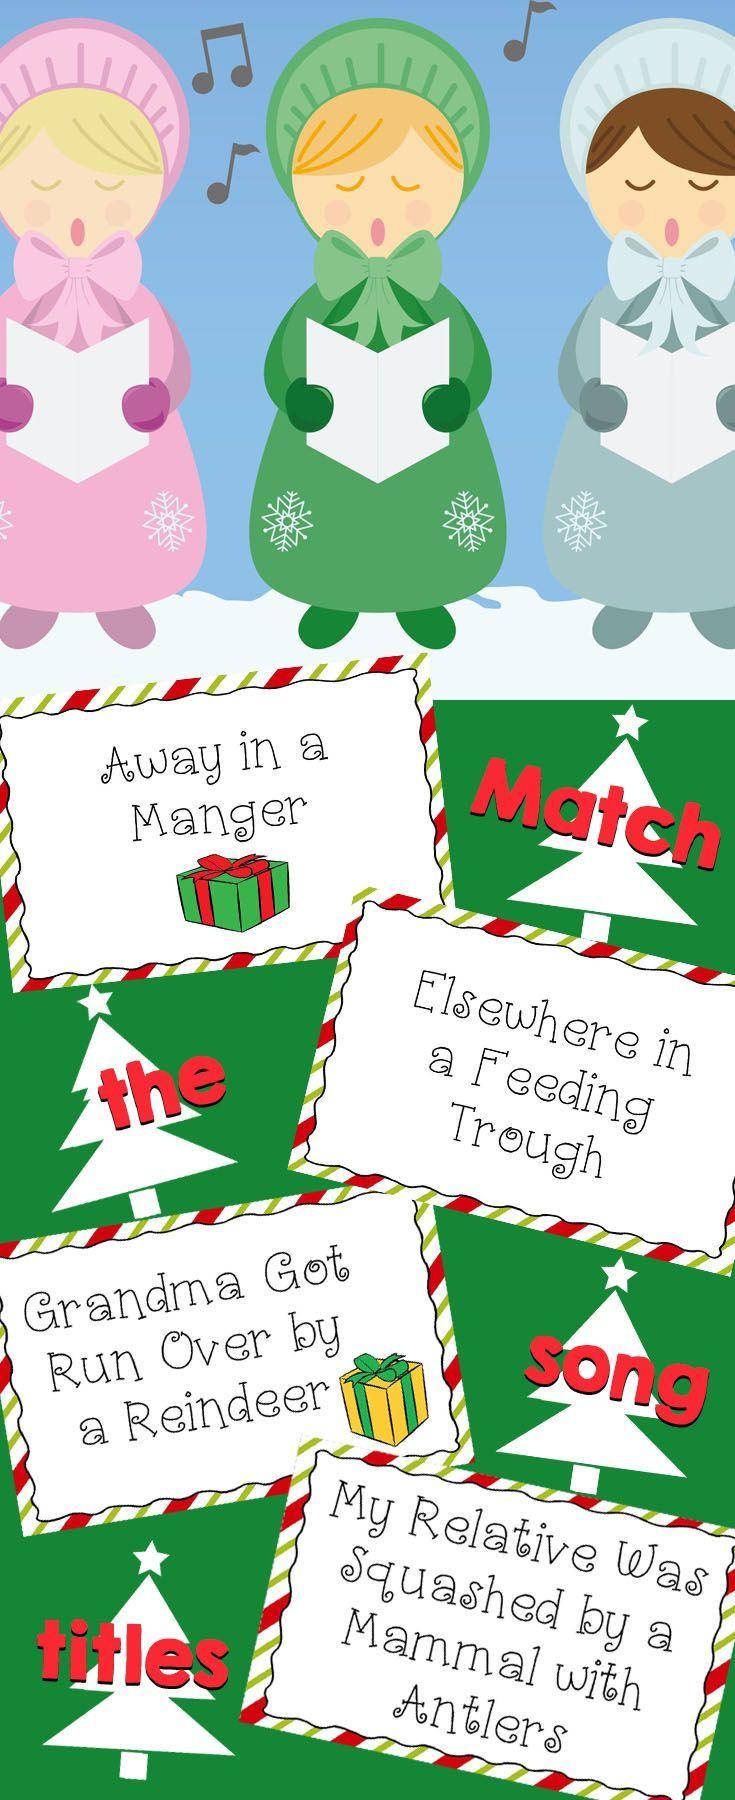 Match 20 Christma Carol Song Title With Their Twin Using Card Or A Worksheet Activities Teaching Paraphrasing Lyrics Lyric